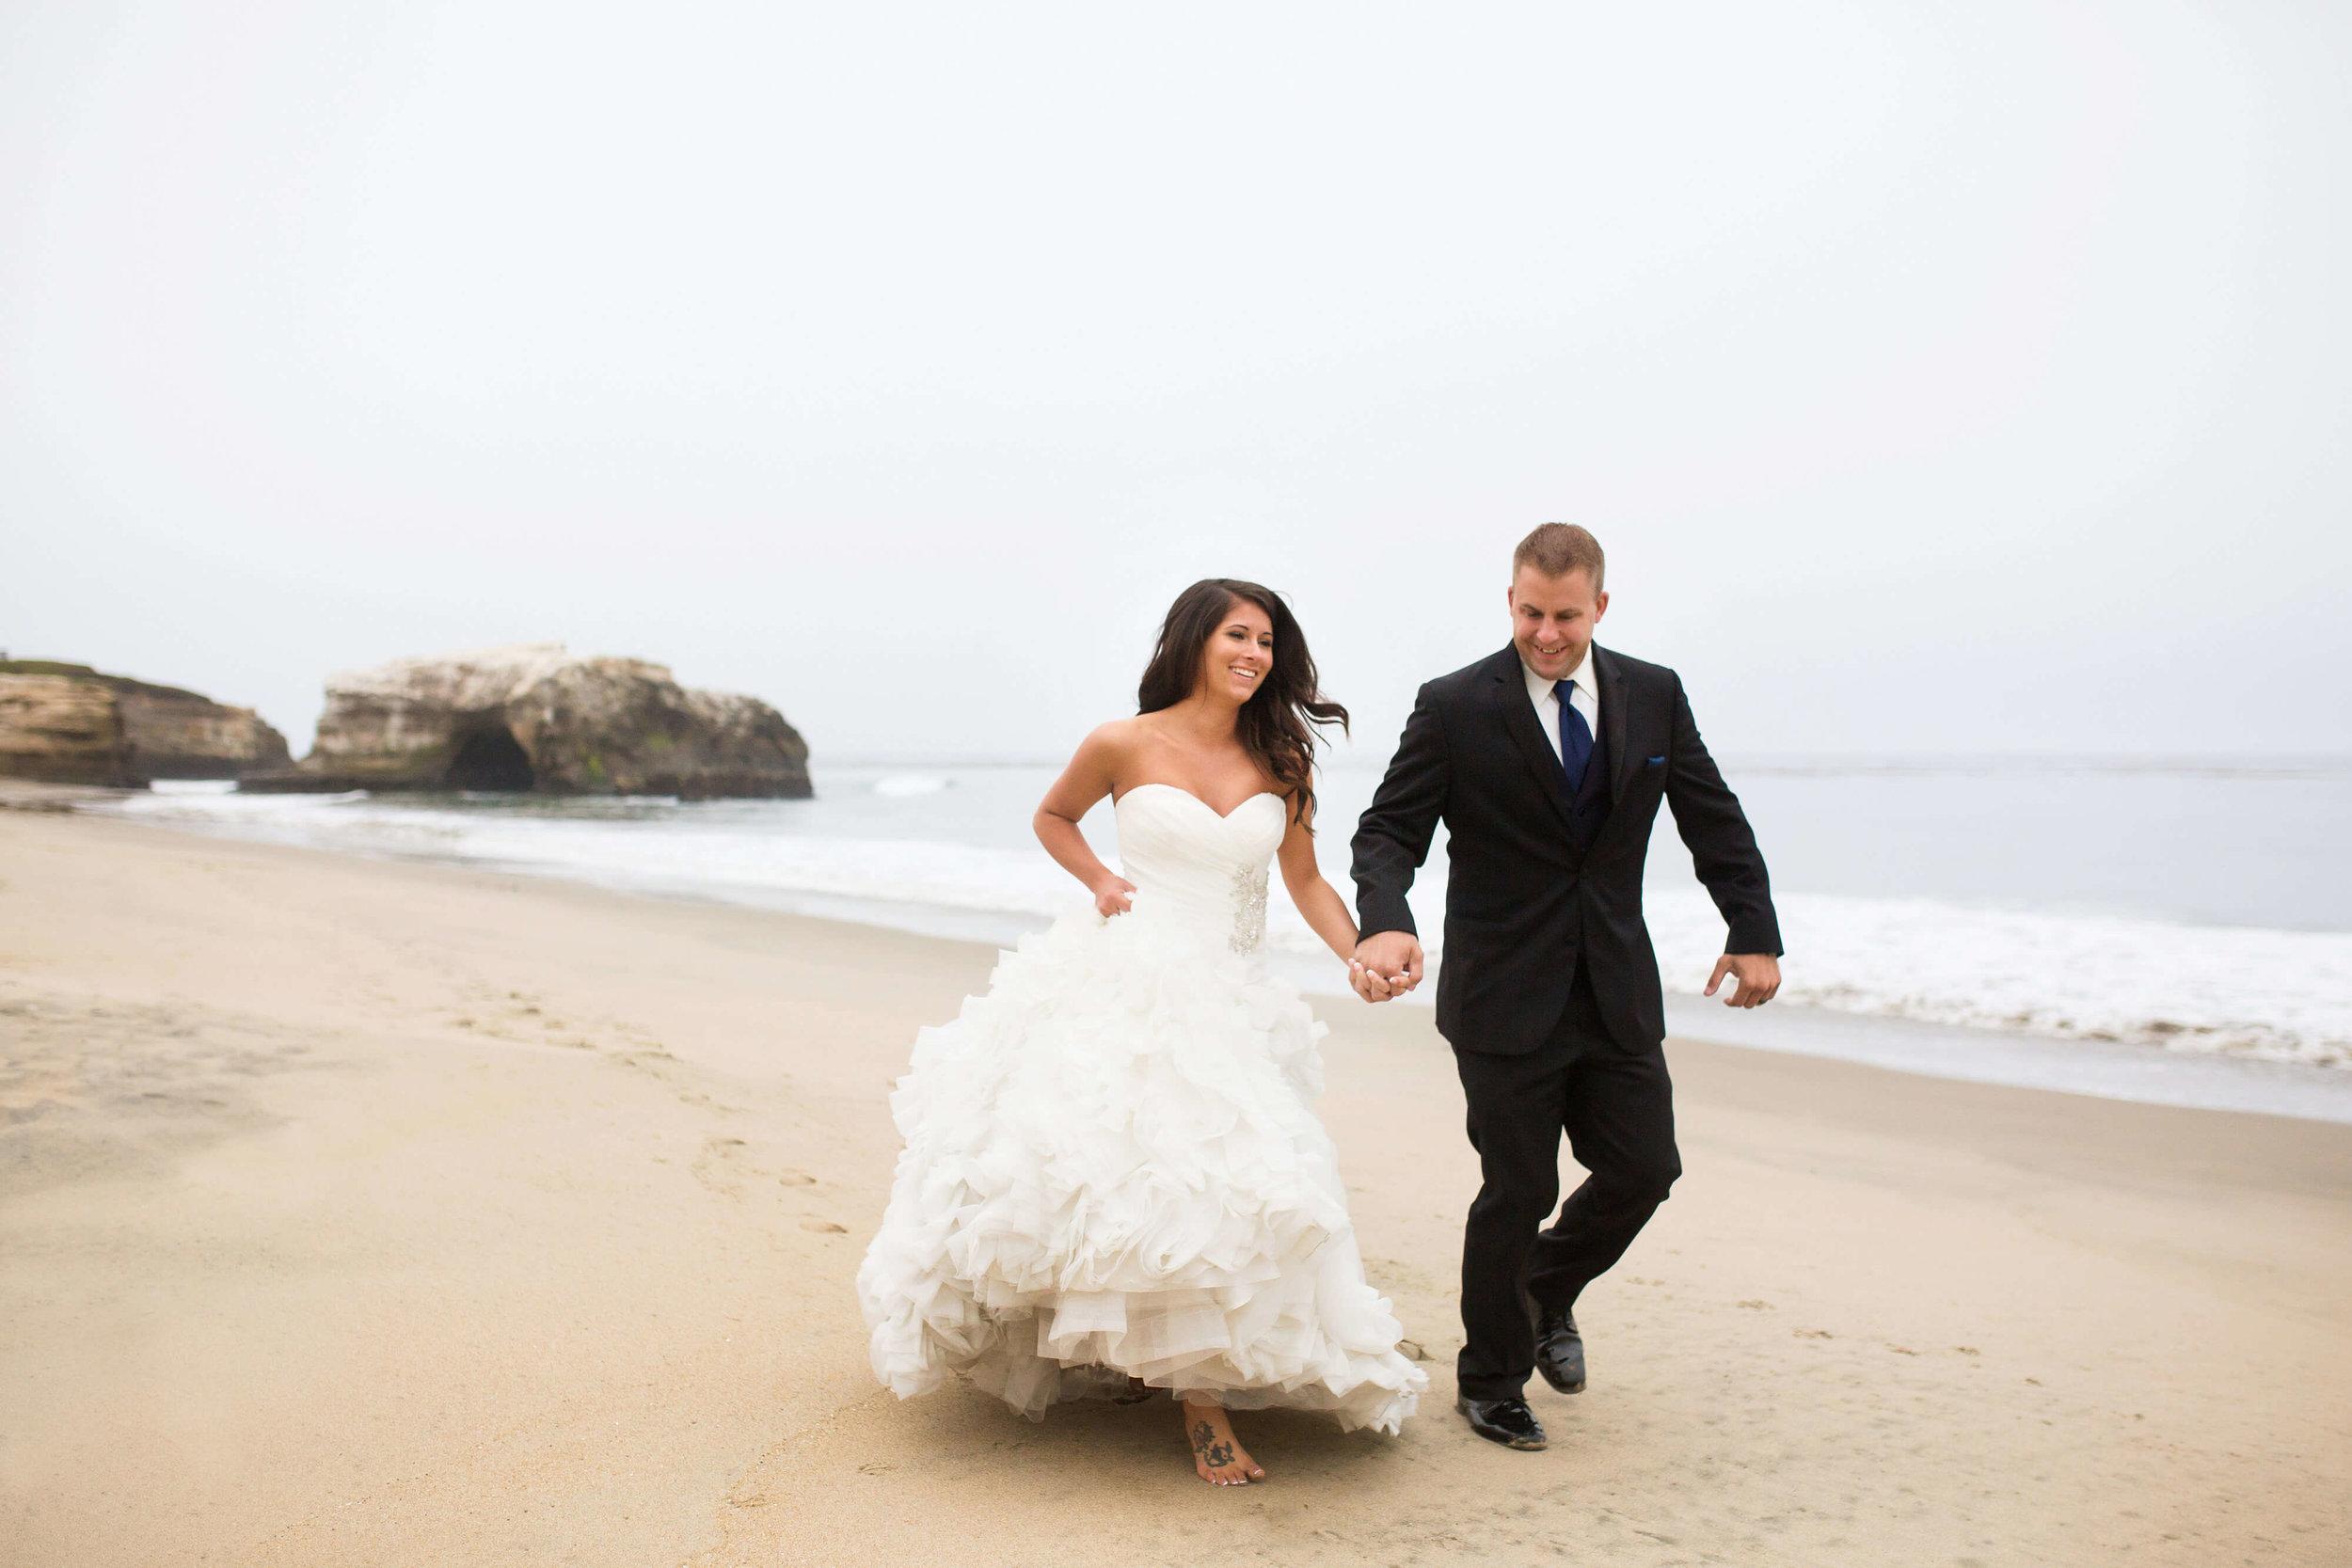 bride and groom running on the beach | Minnesota wedding photographer Studio KH wedding dress details | wedding blog | Sixpence Events 70 Ways to Photograph Your Wedding Dress.jpg